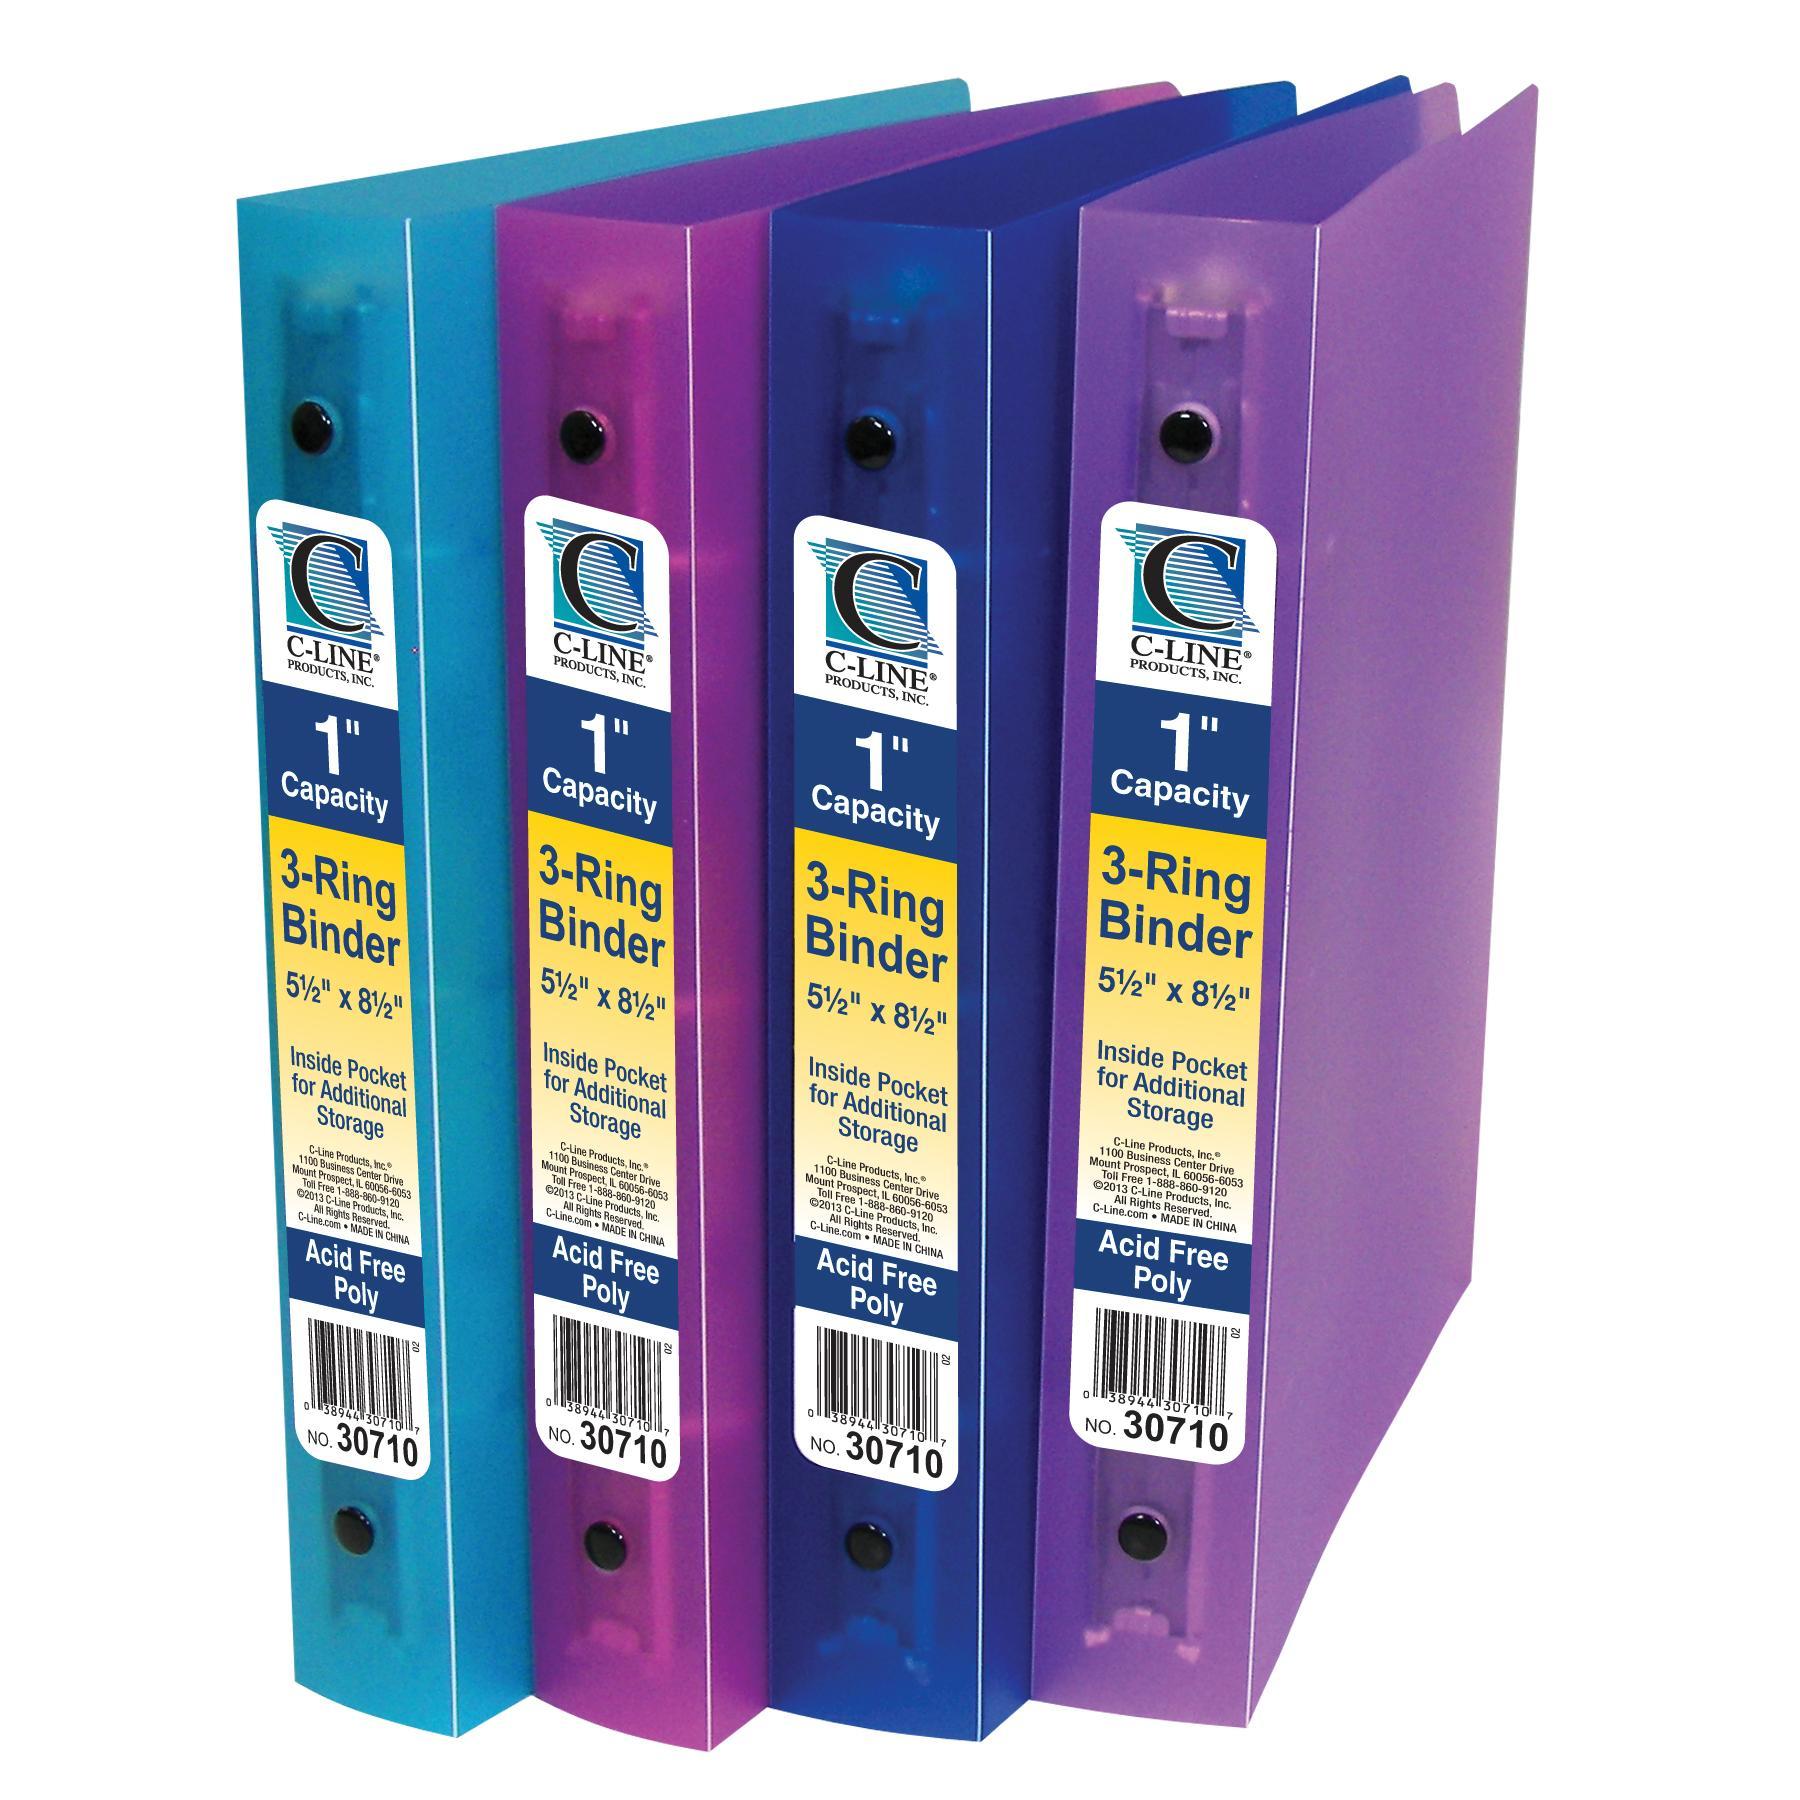 Amazon.com : C-Line Mini Binder Starter Kit, Includes